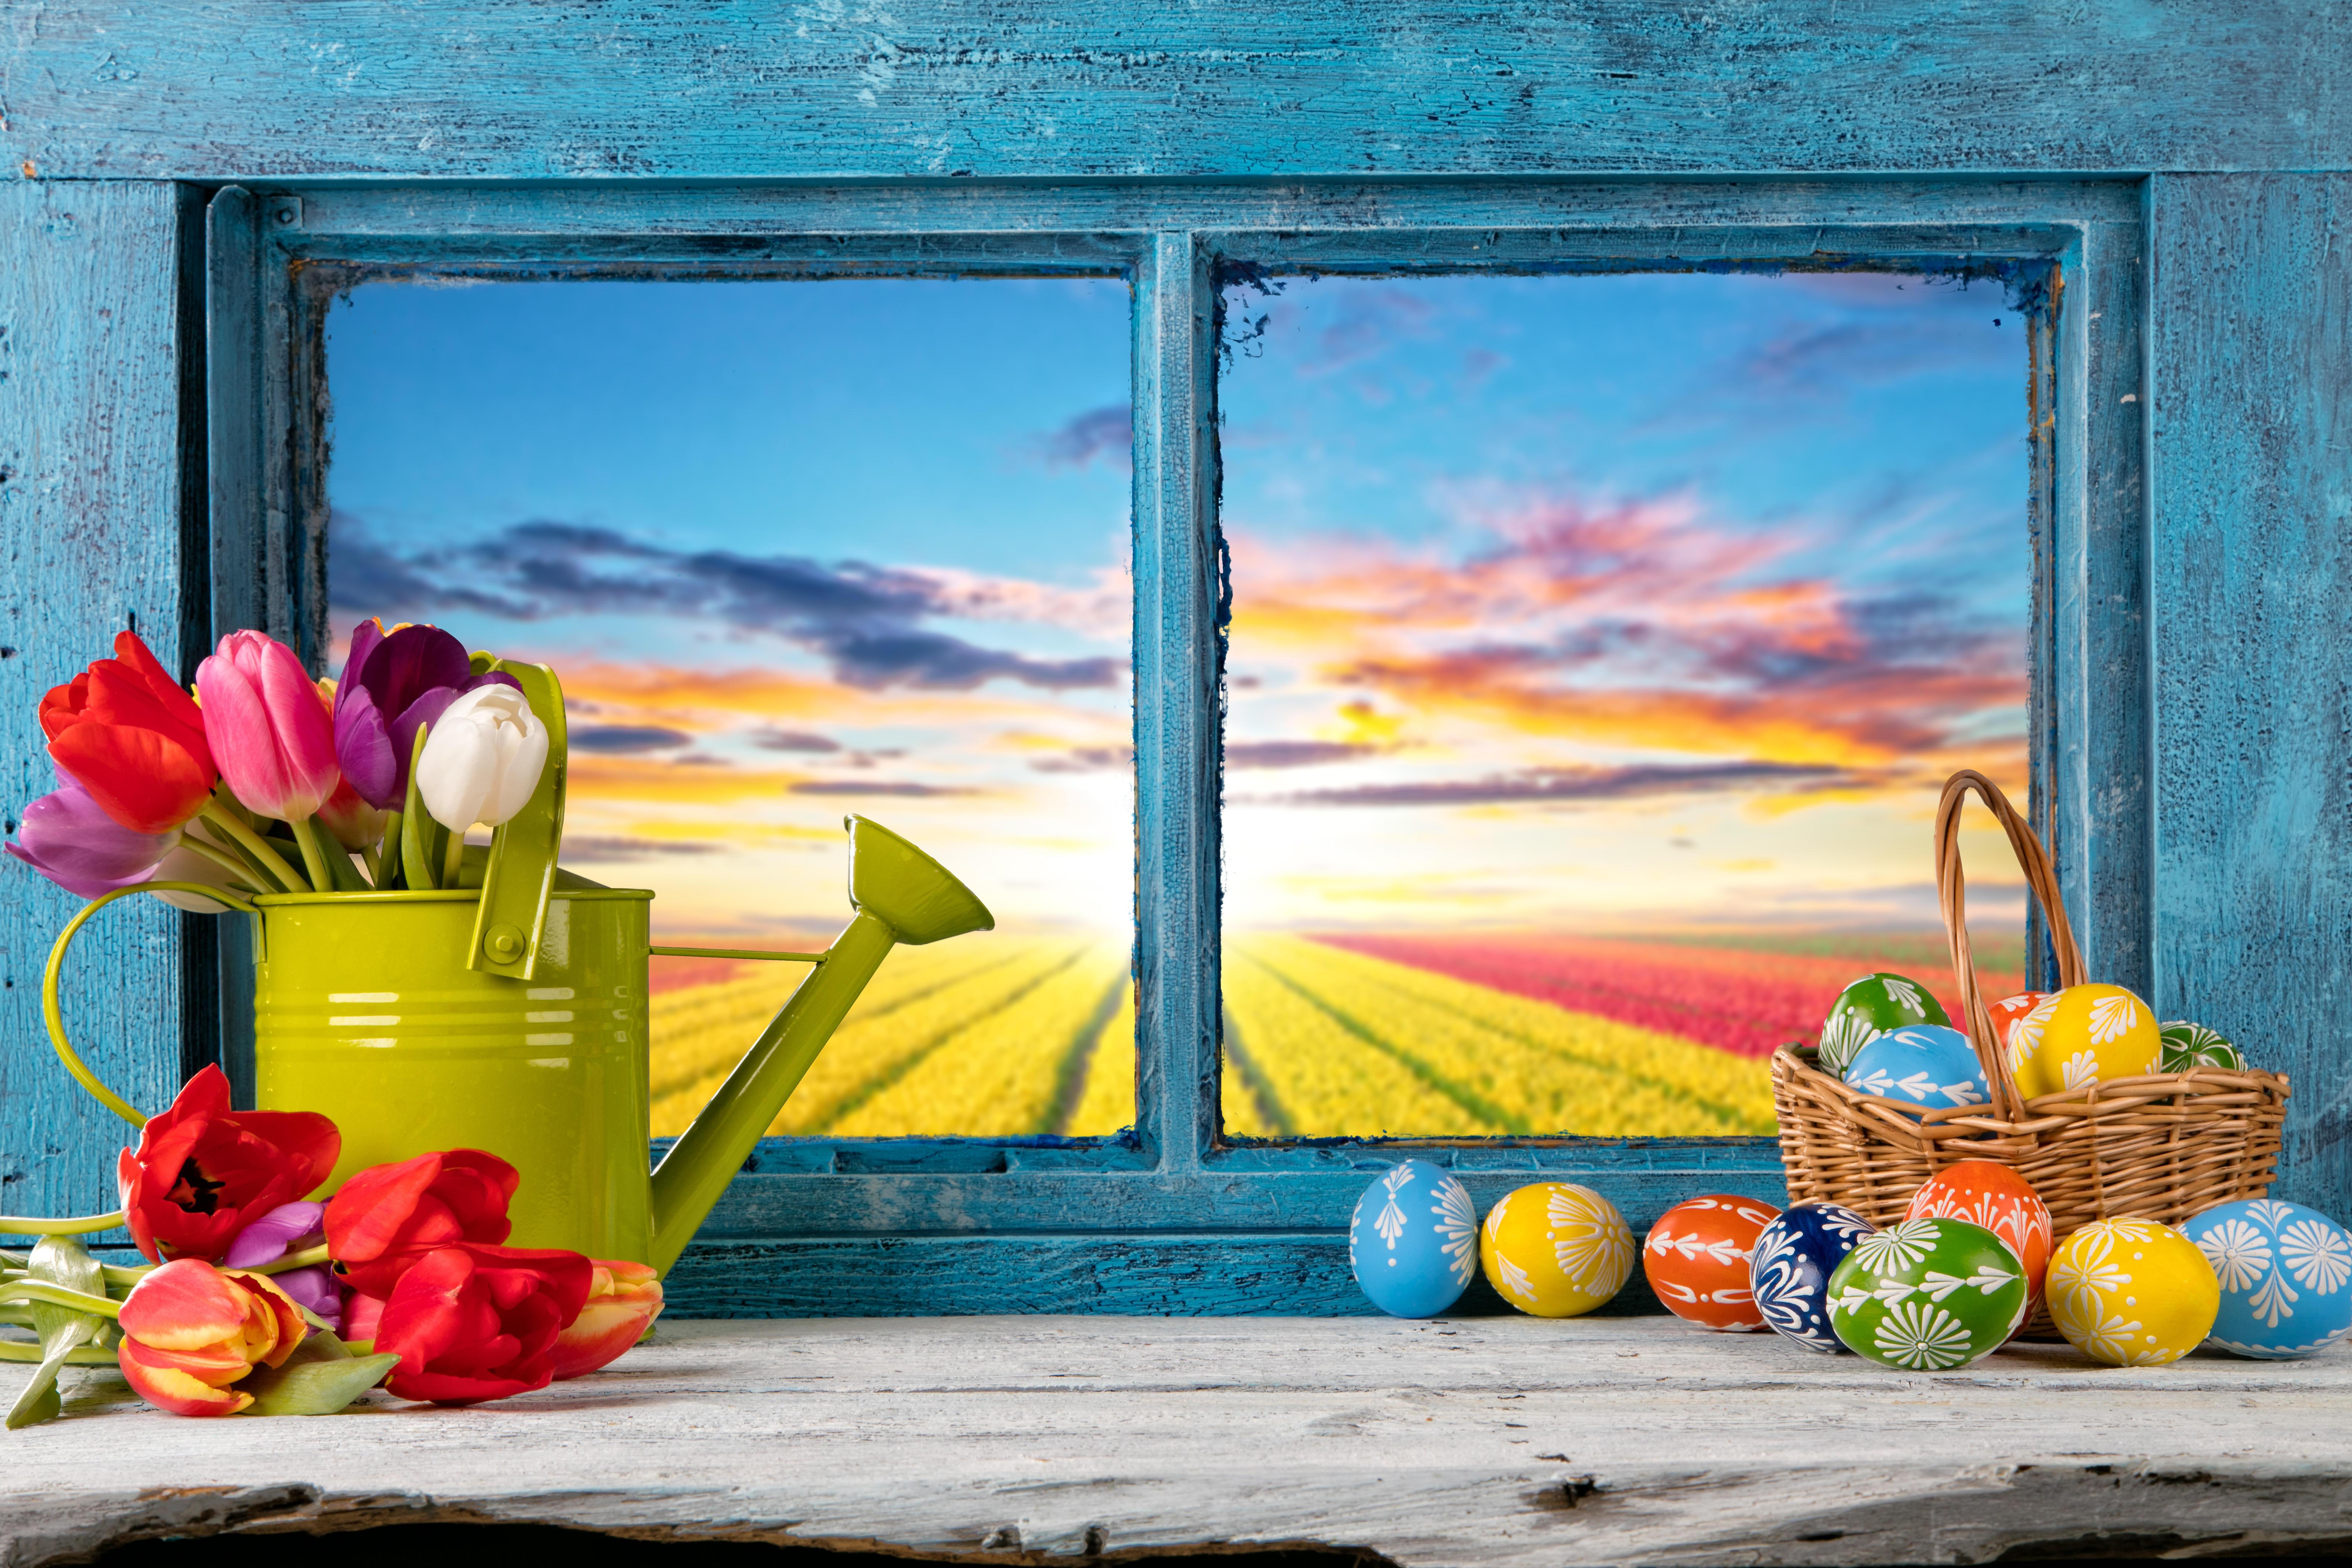 весна за окном бесплатно